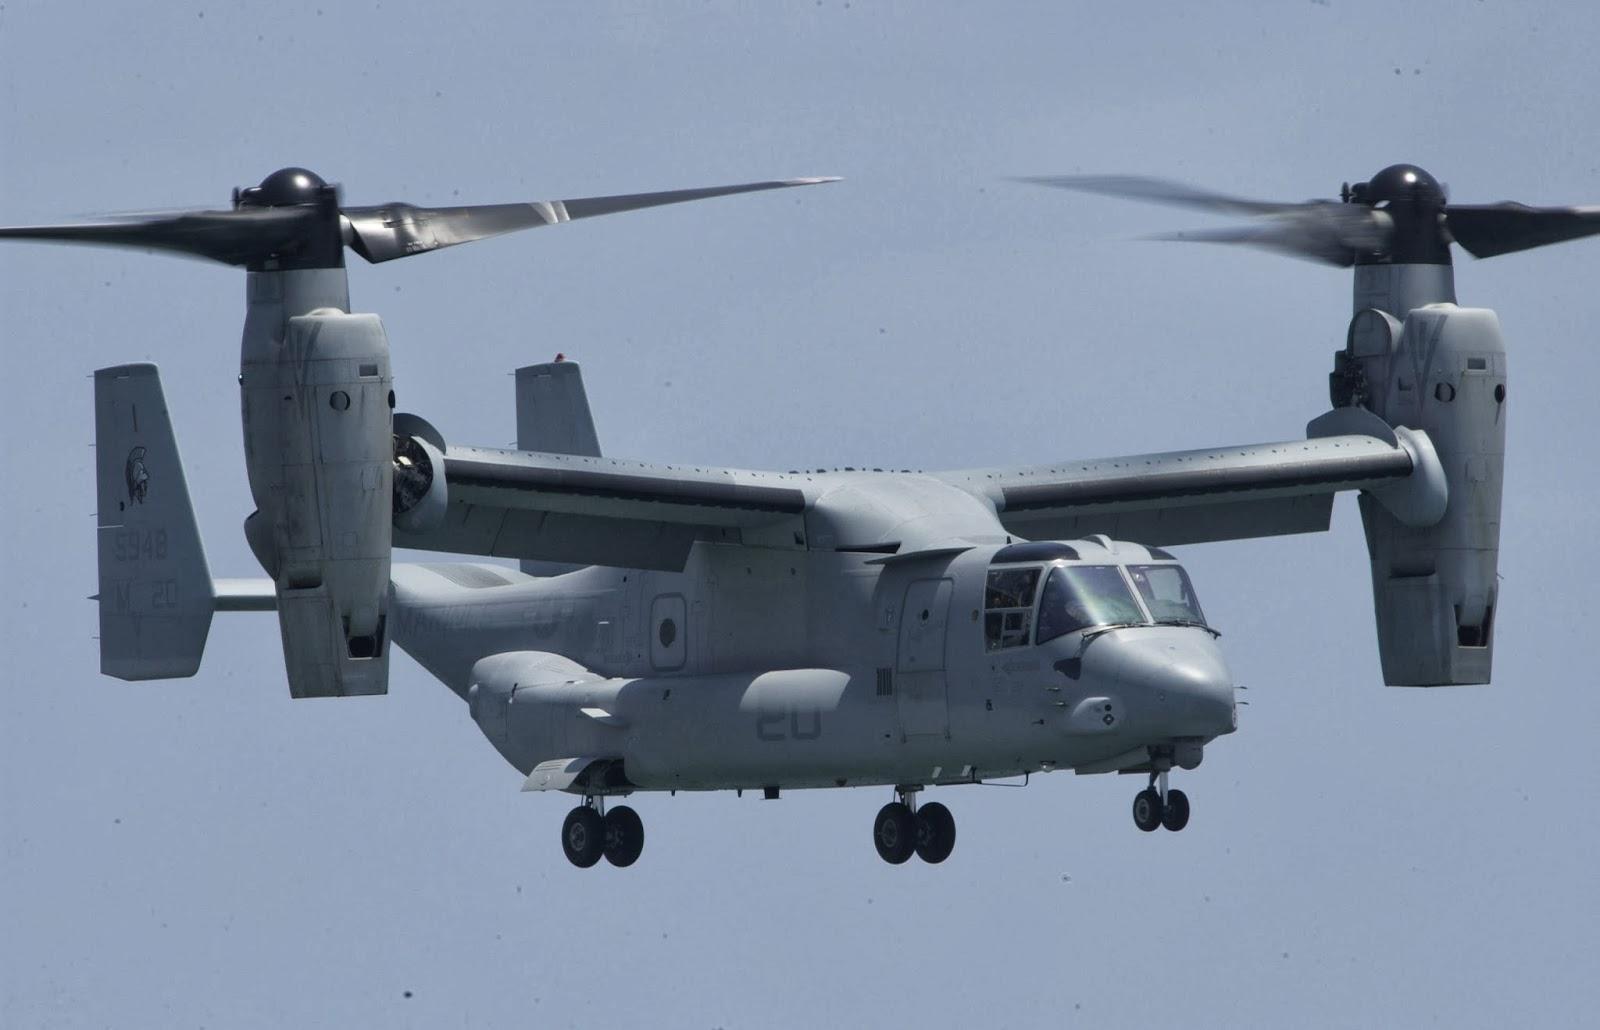 Elicottero Osprey : Snafu how do you make a v into gunship